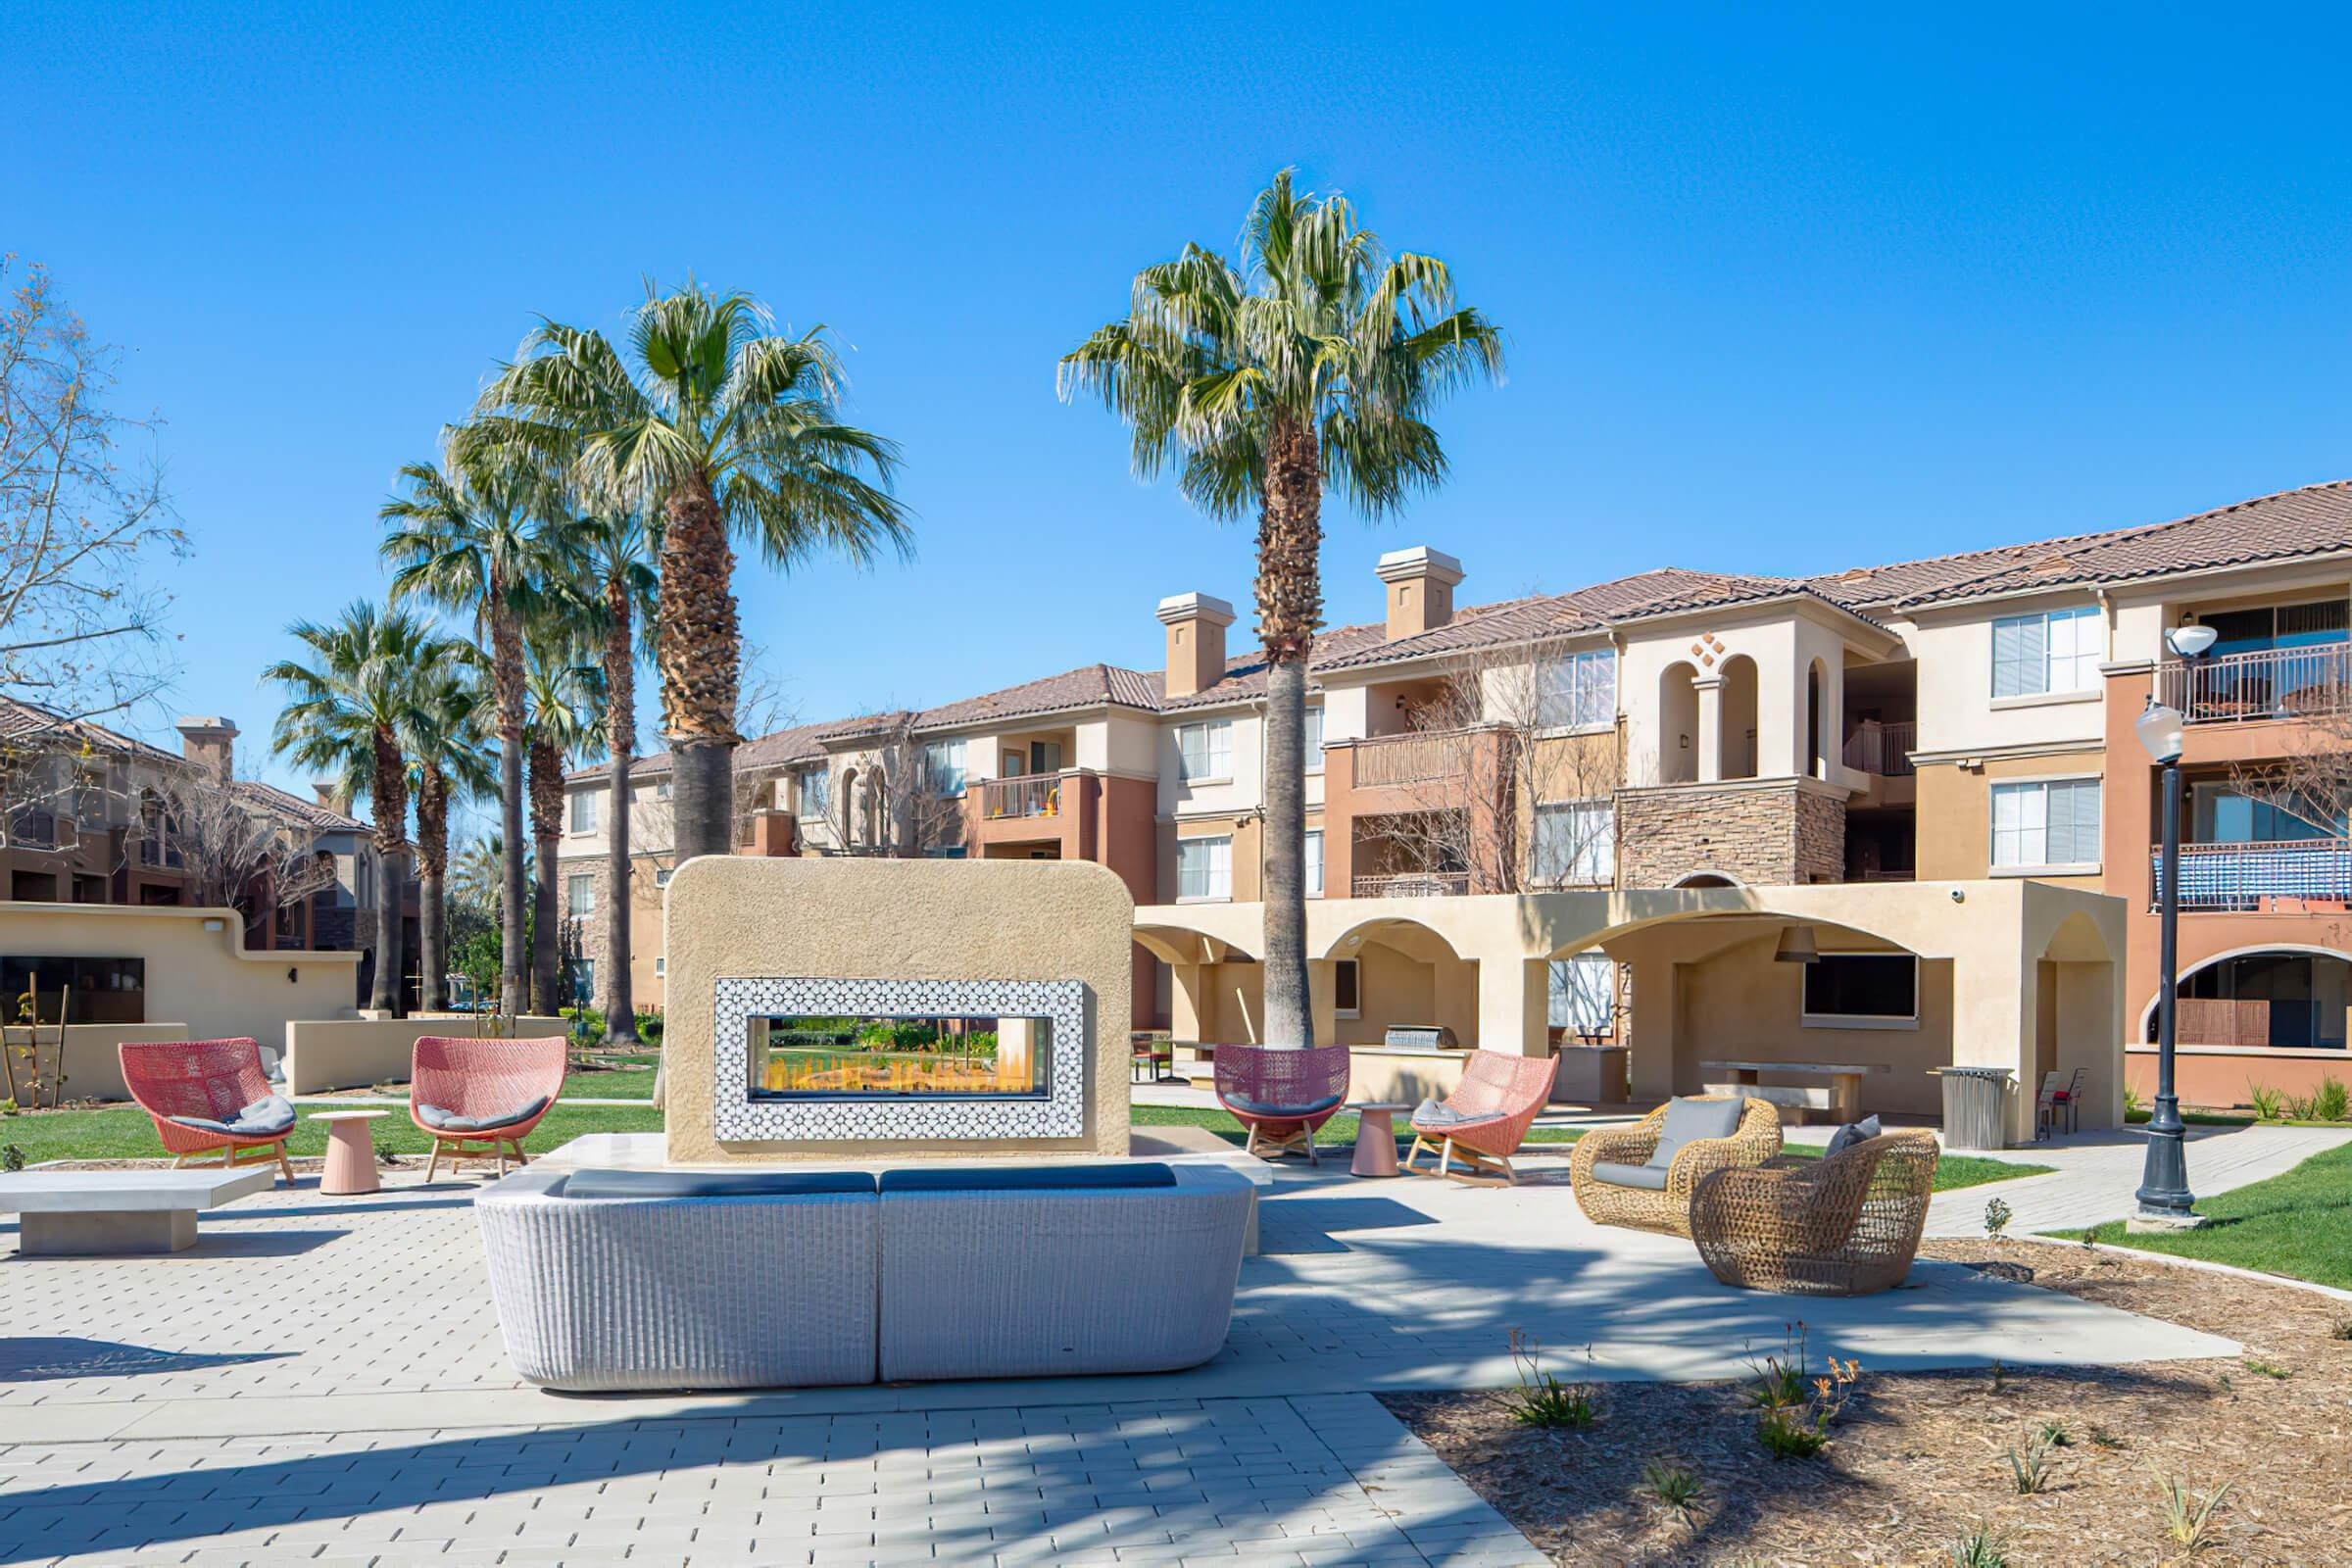 Apartments in Rancho Cucamonga Ca